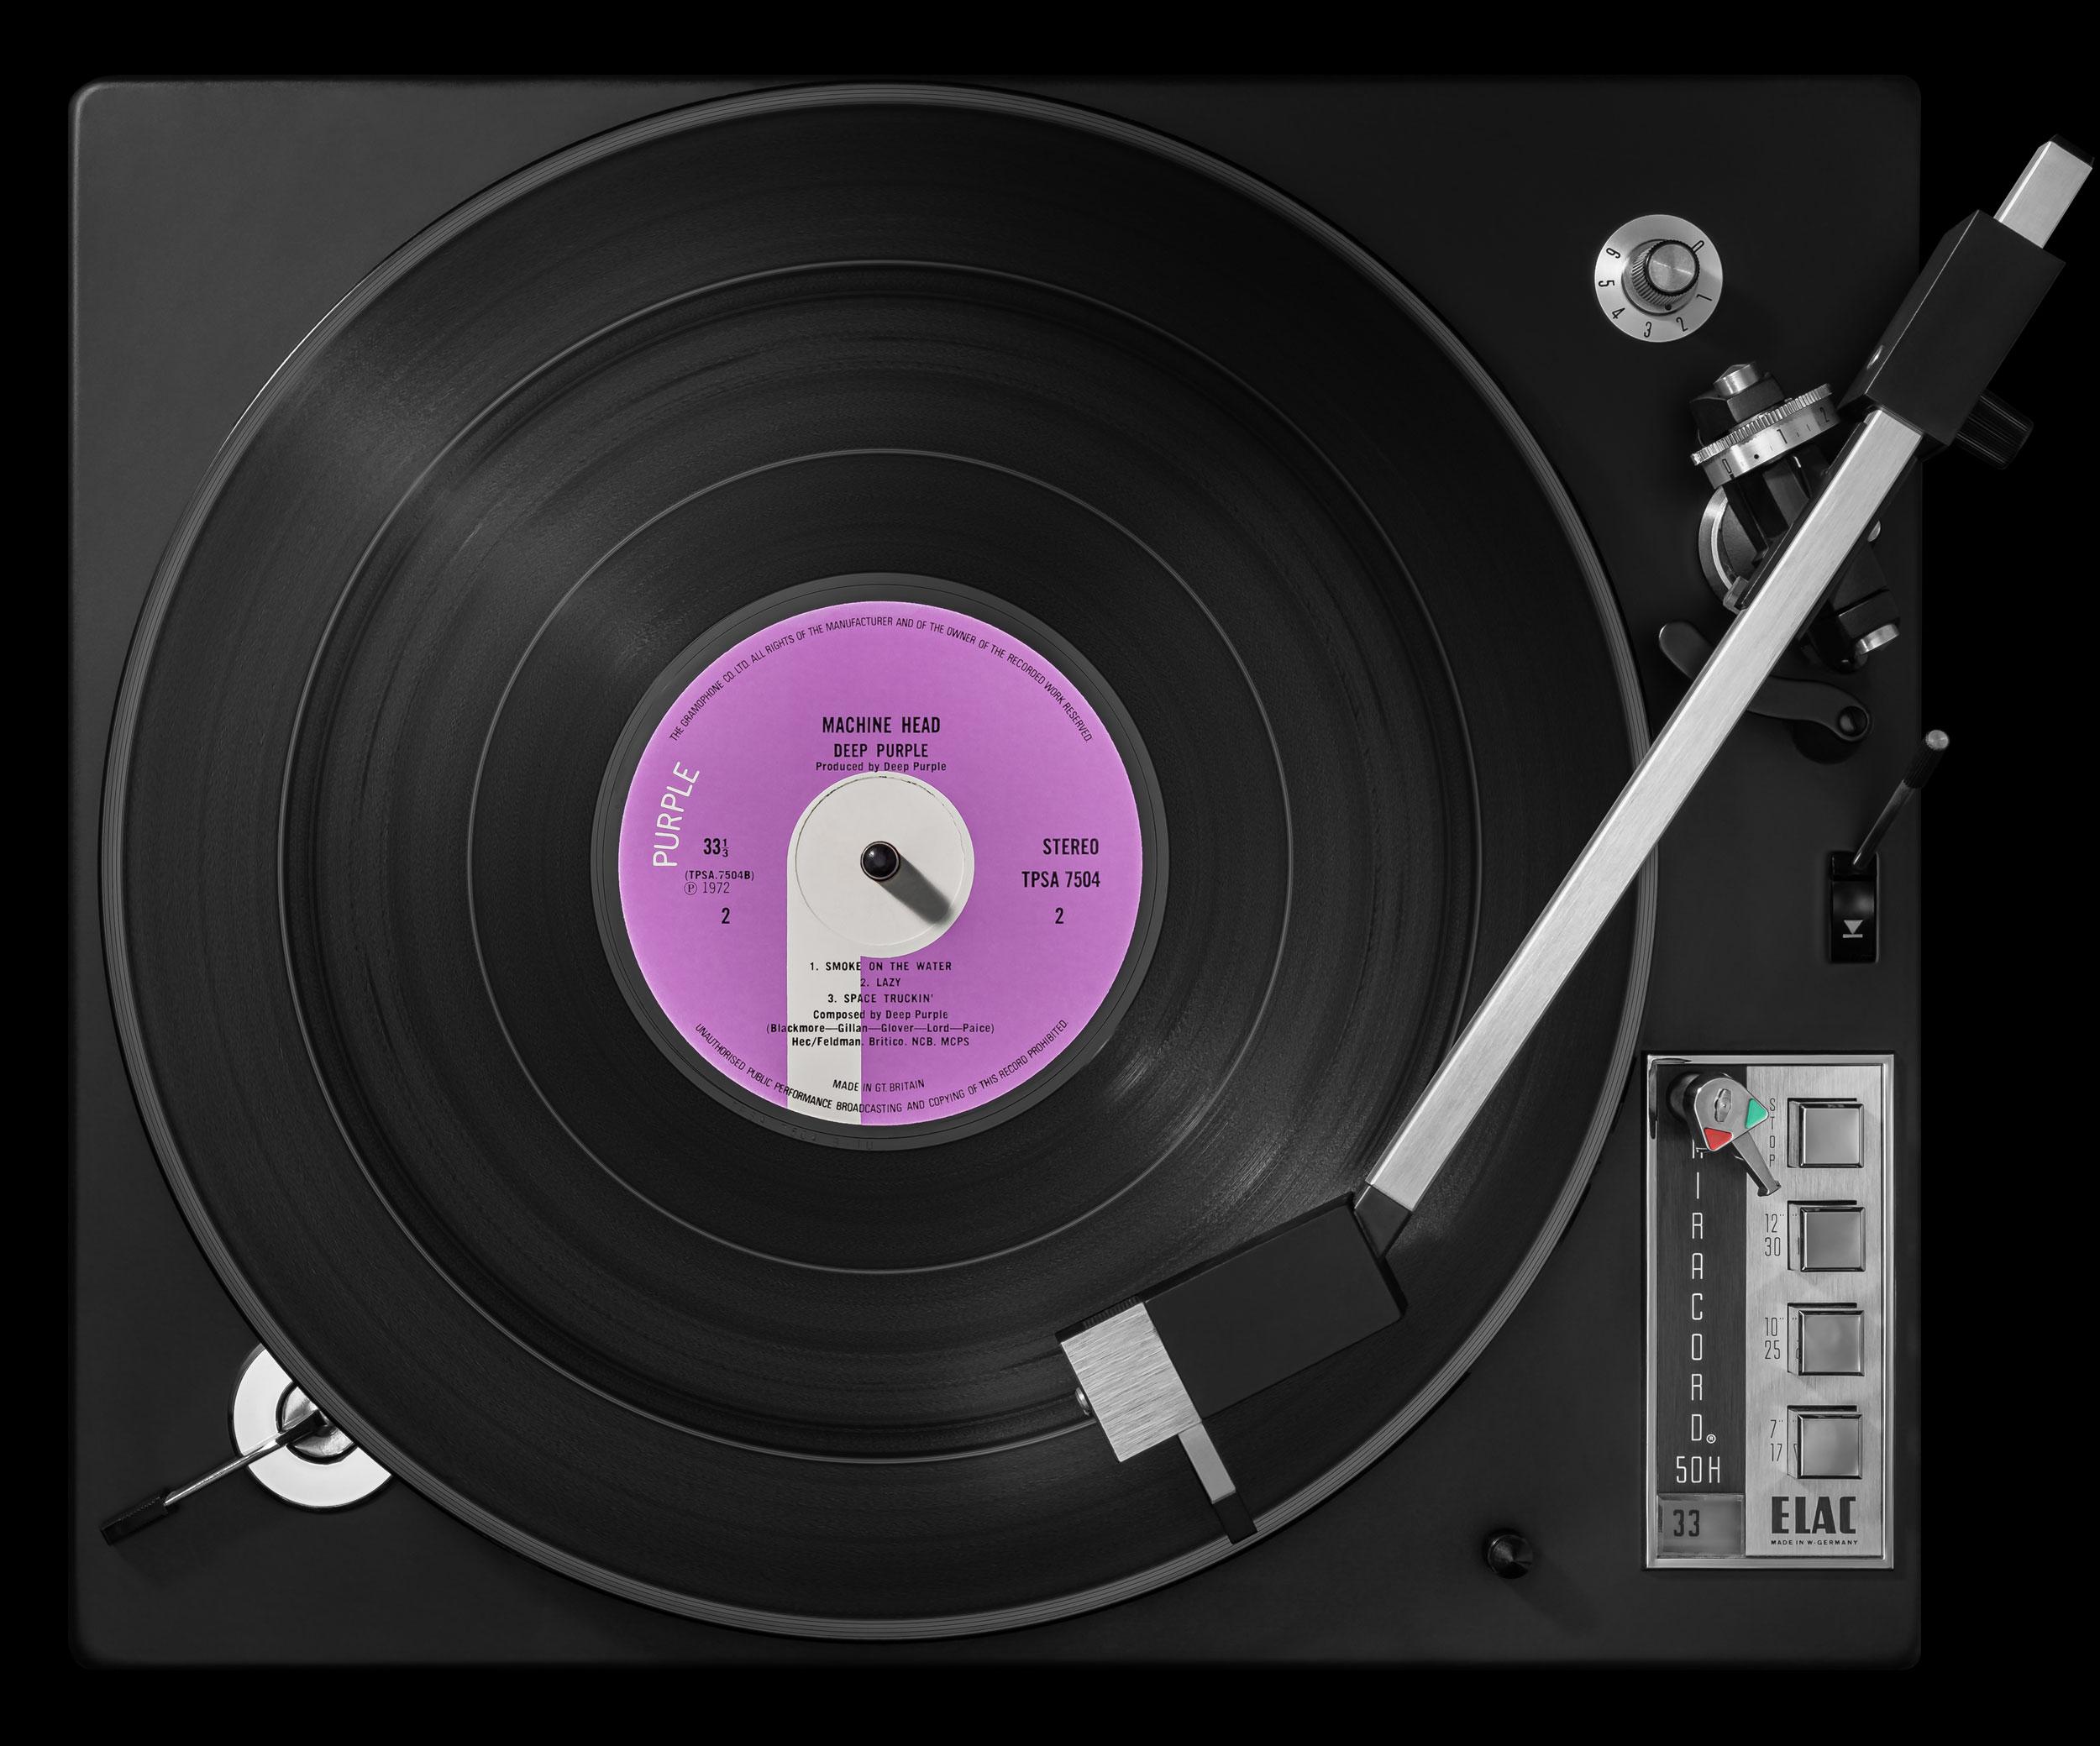 Vinylography No. 22 Deep Purple Machine Head on ELAC Miracord